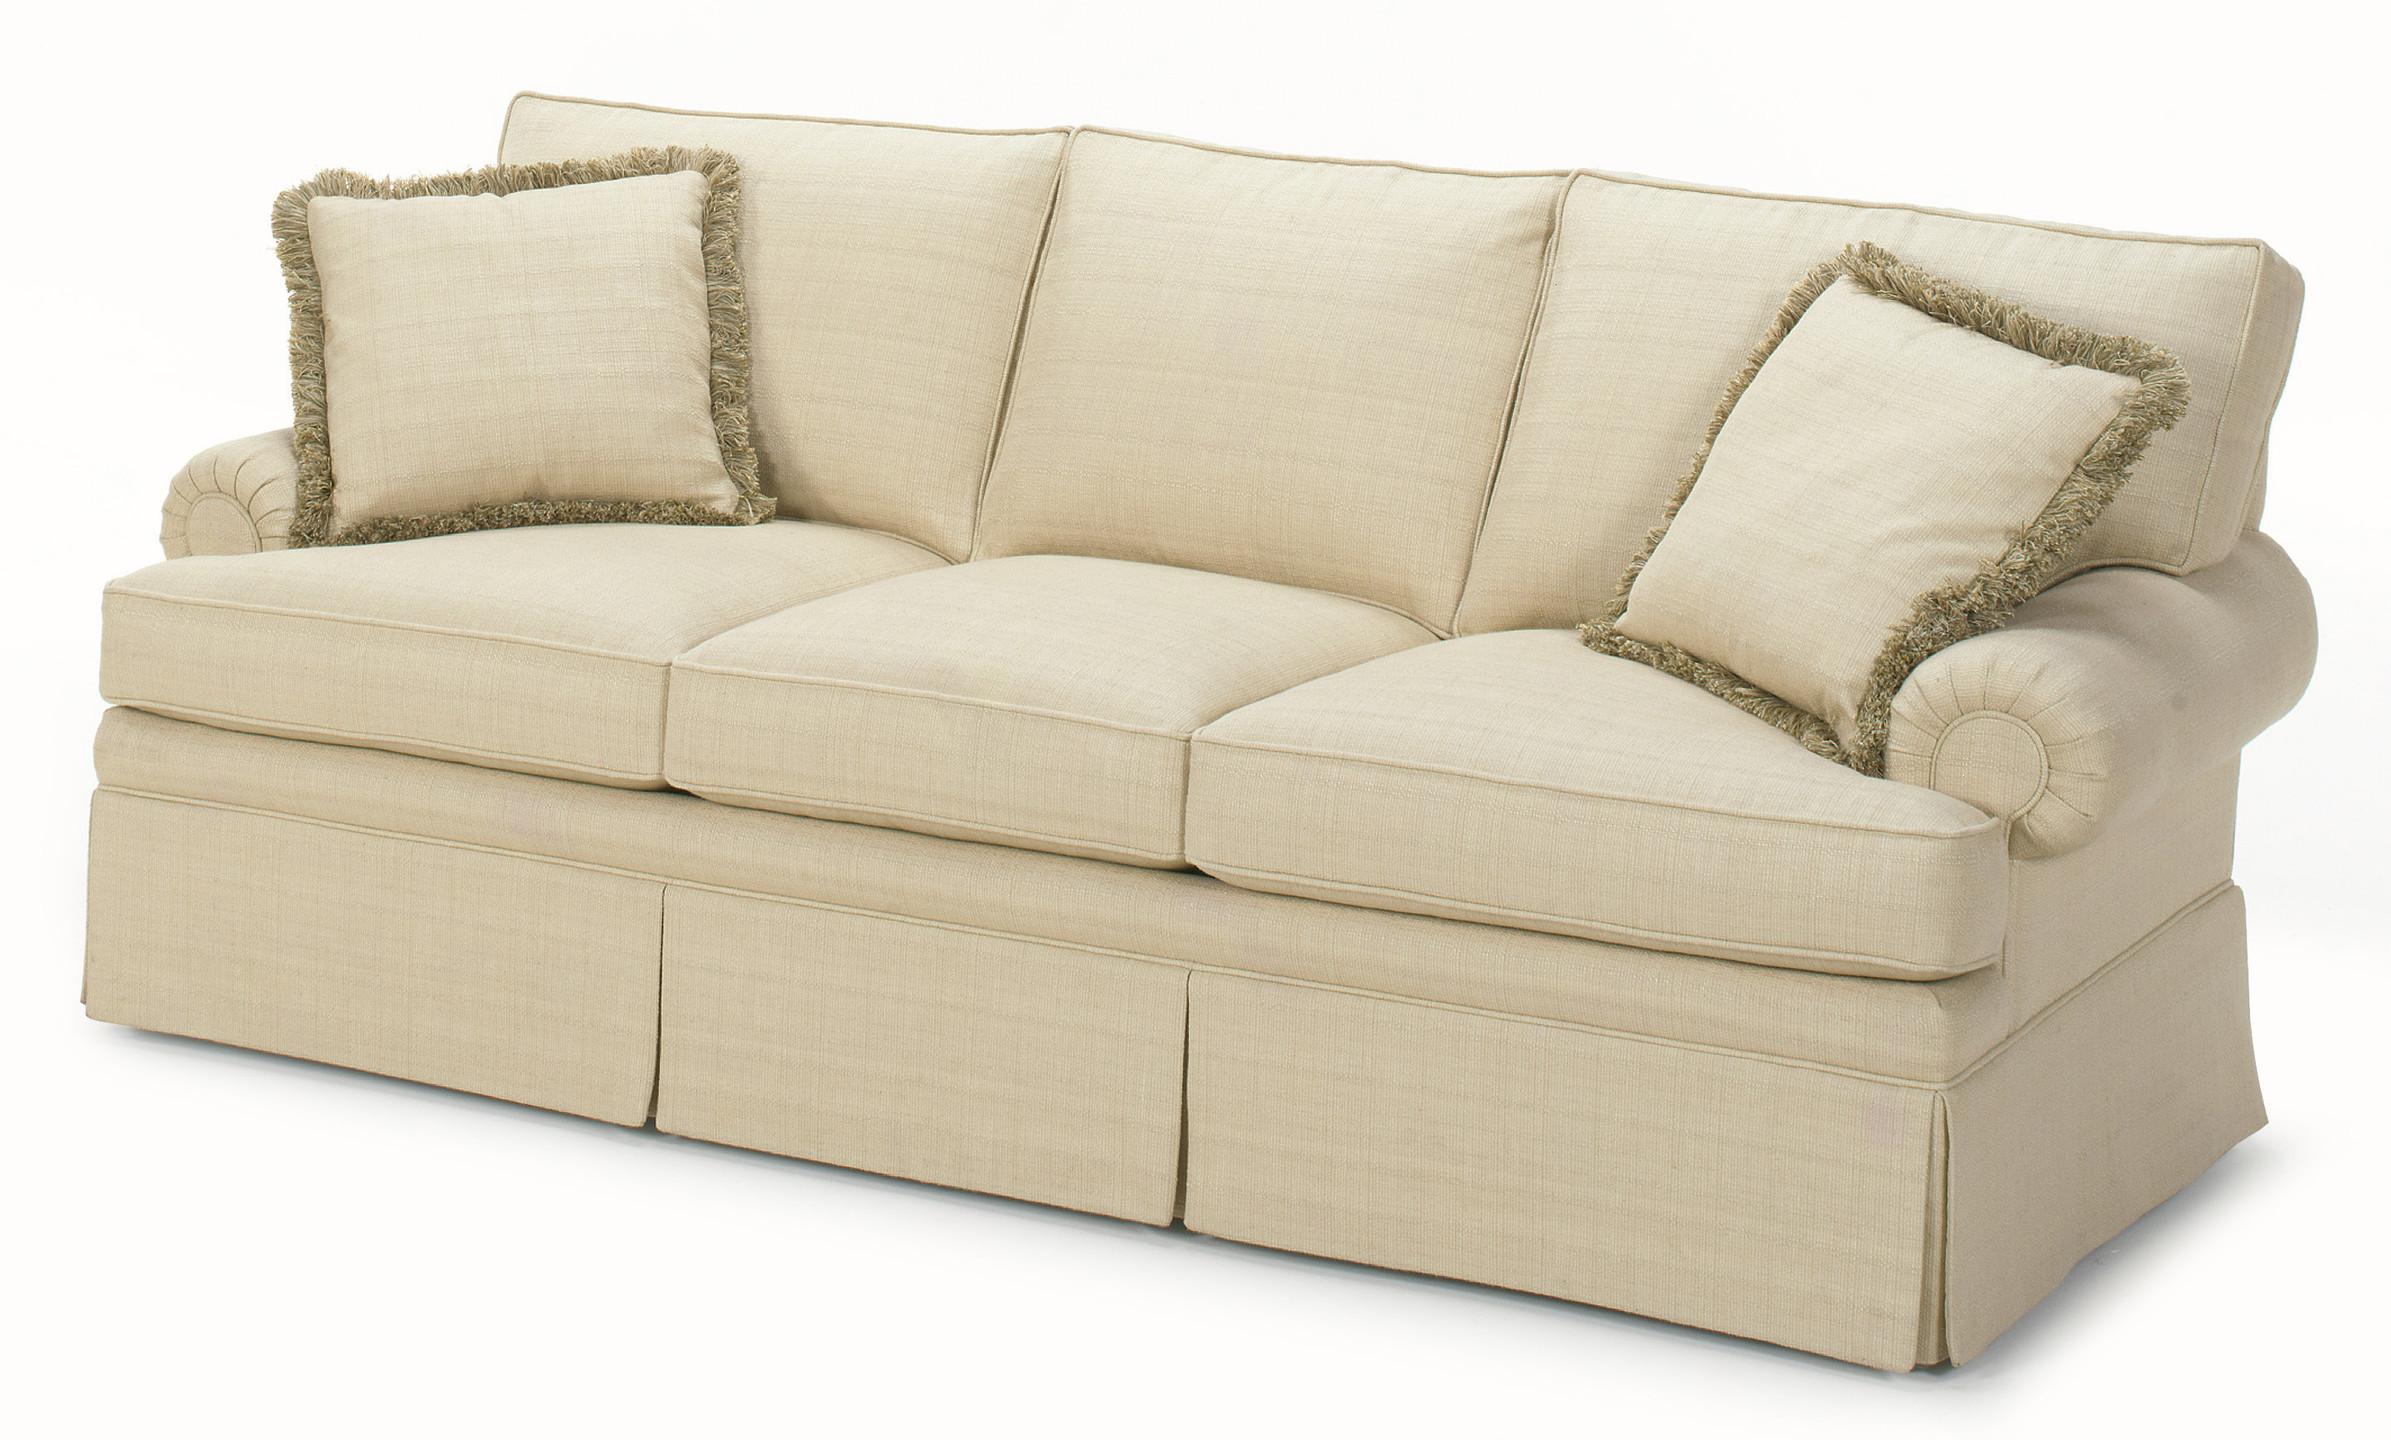 As You Like It Lawson Arm Three Seat Sofa